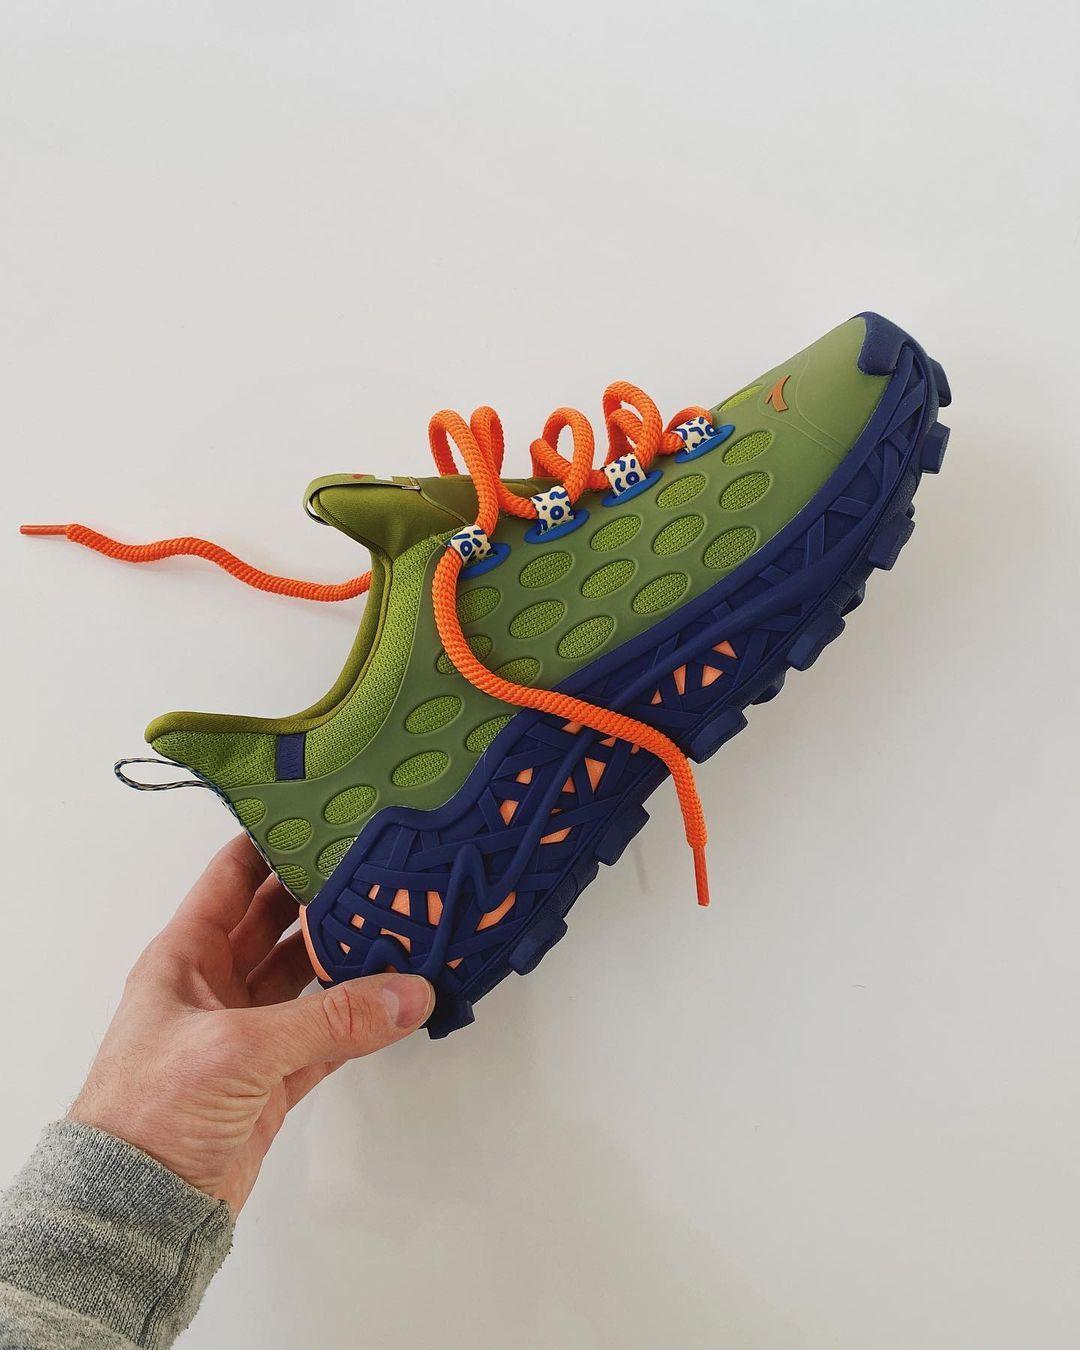 Salehe Bembury's Latest Sneaker Collab Is Funky & We Like It 3